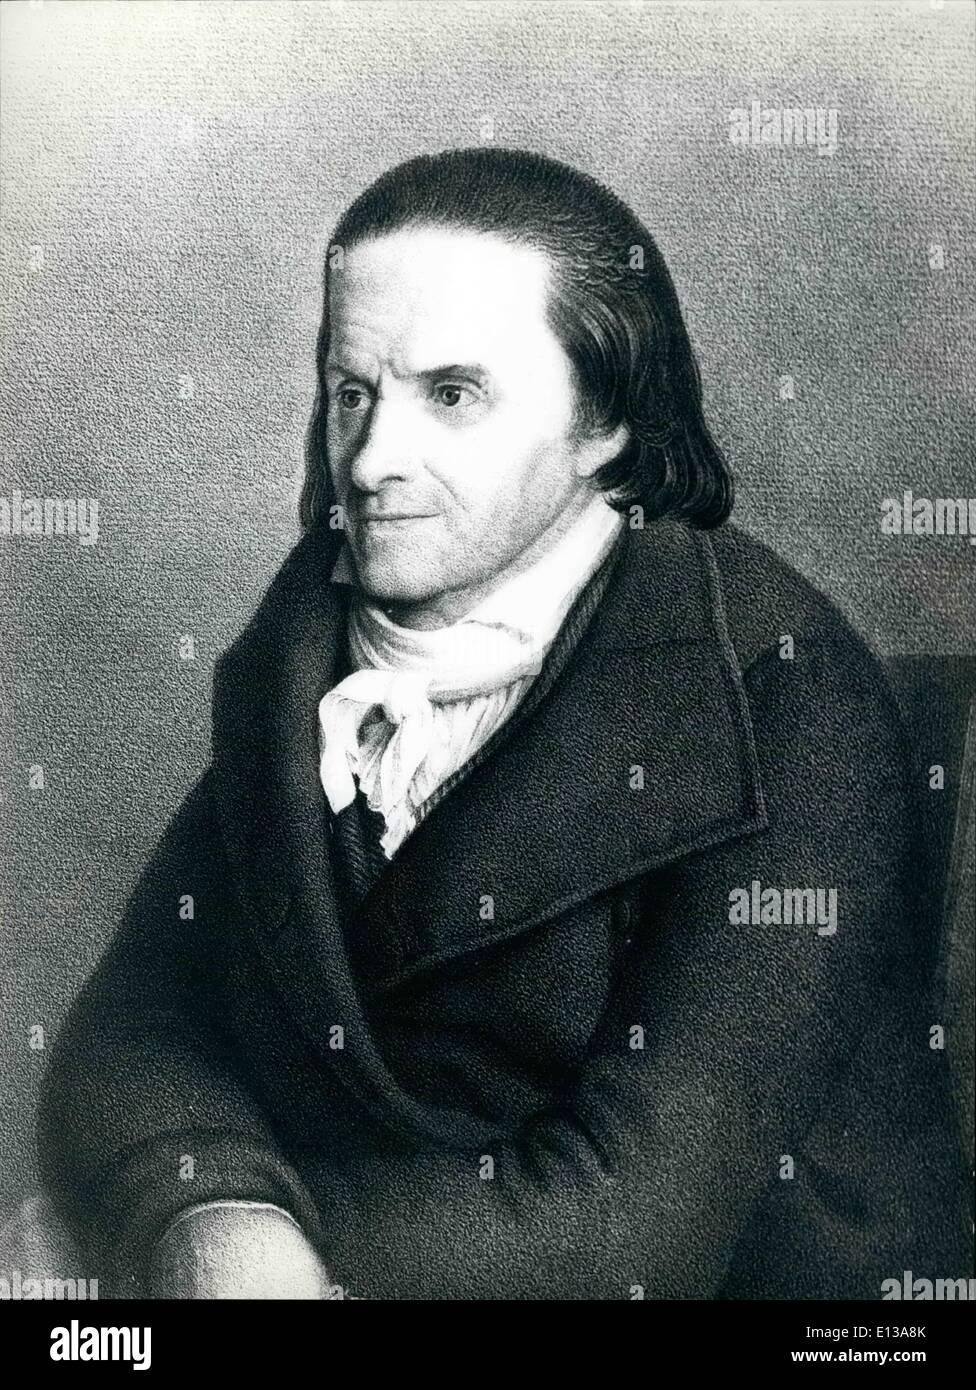 Feb. 29, 2012 - Johann Heinrich Pestalozzi 1746-1827. - Stock Image